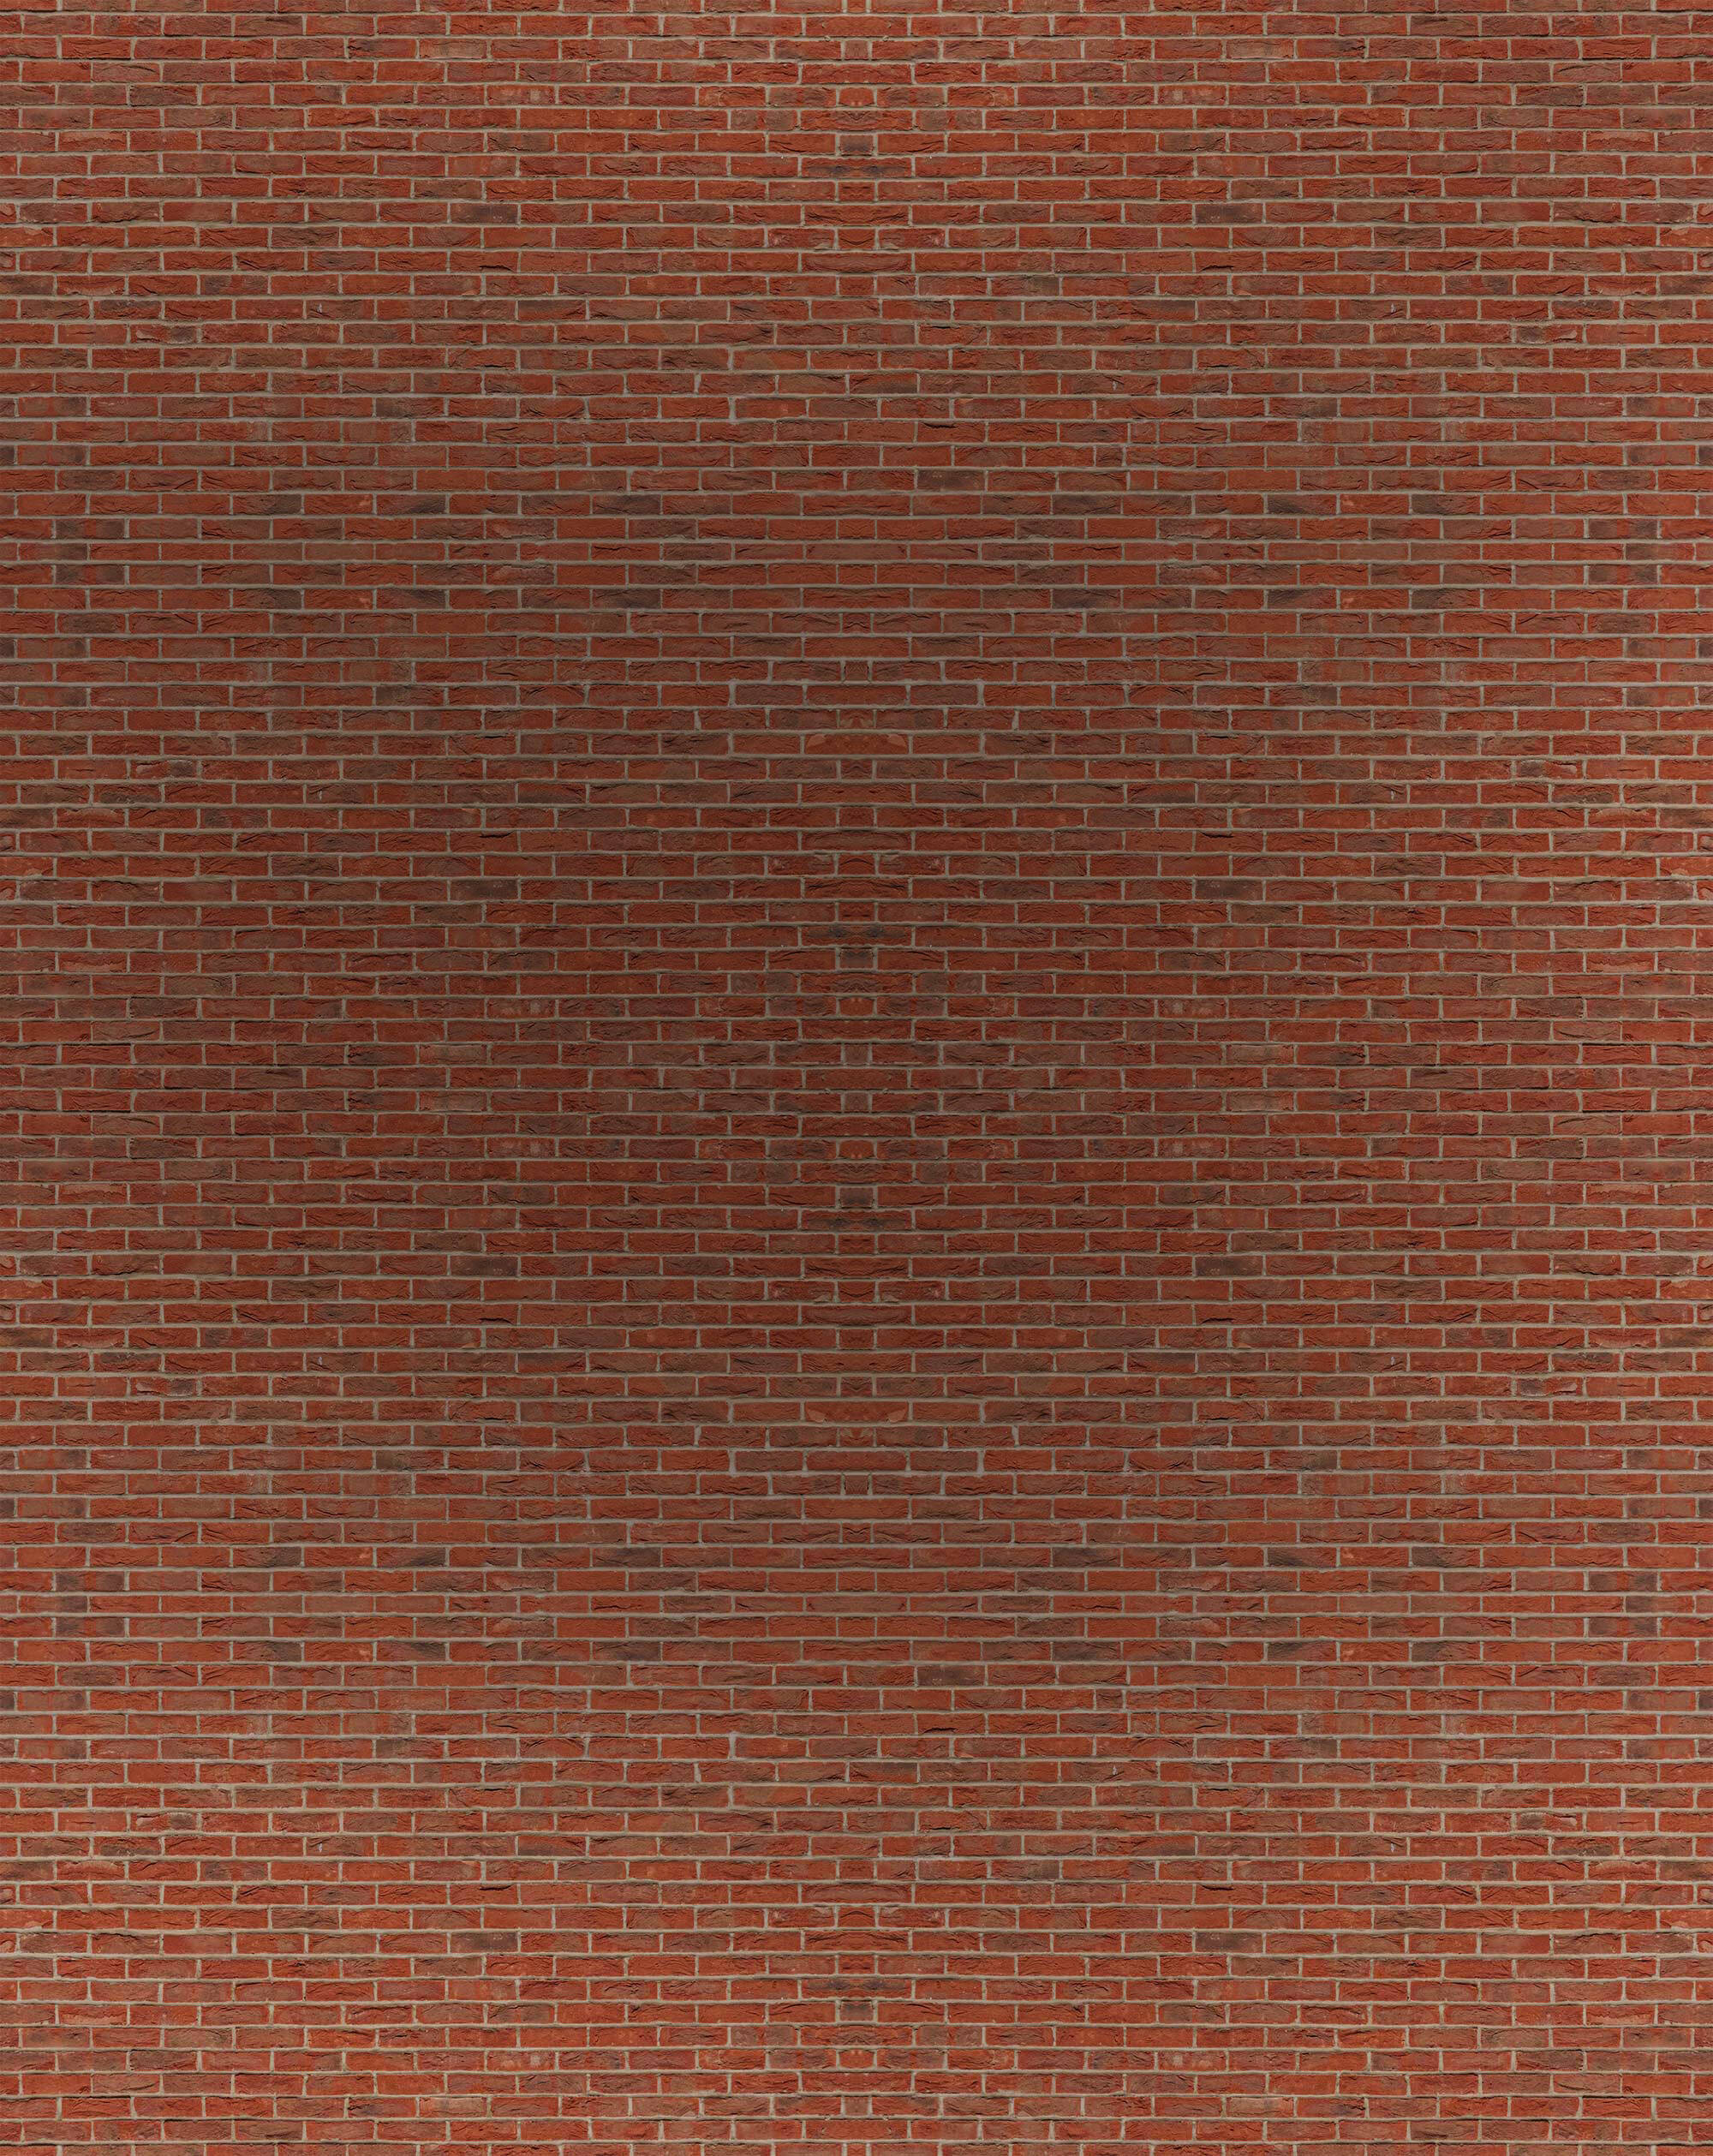 Wall (Copy)